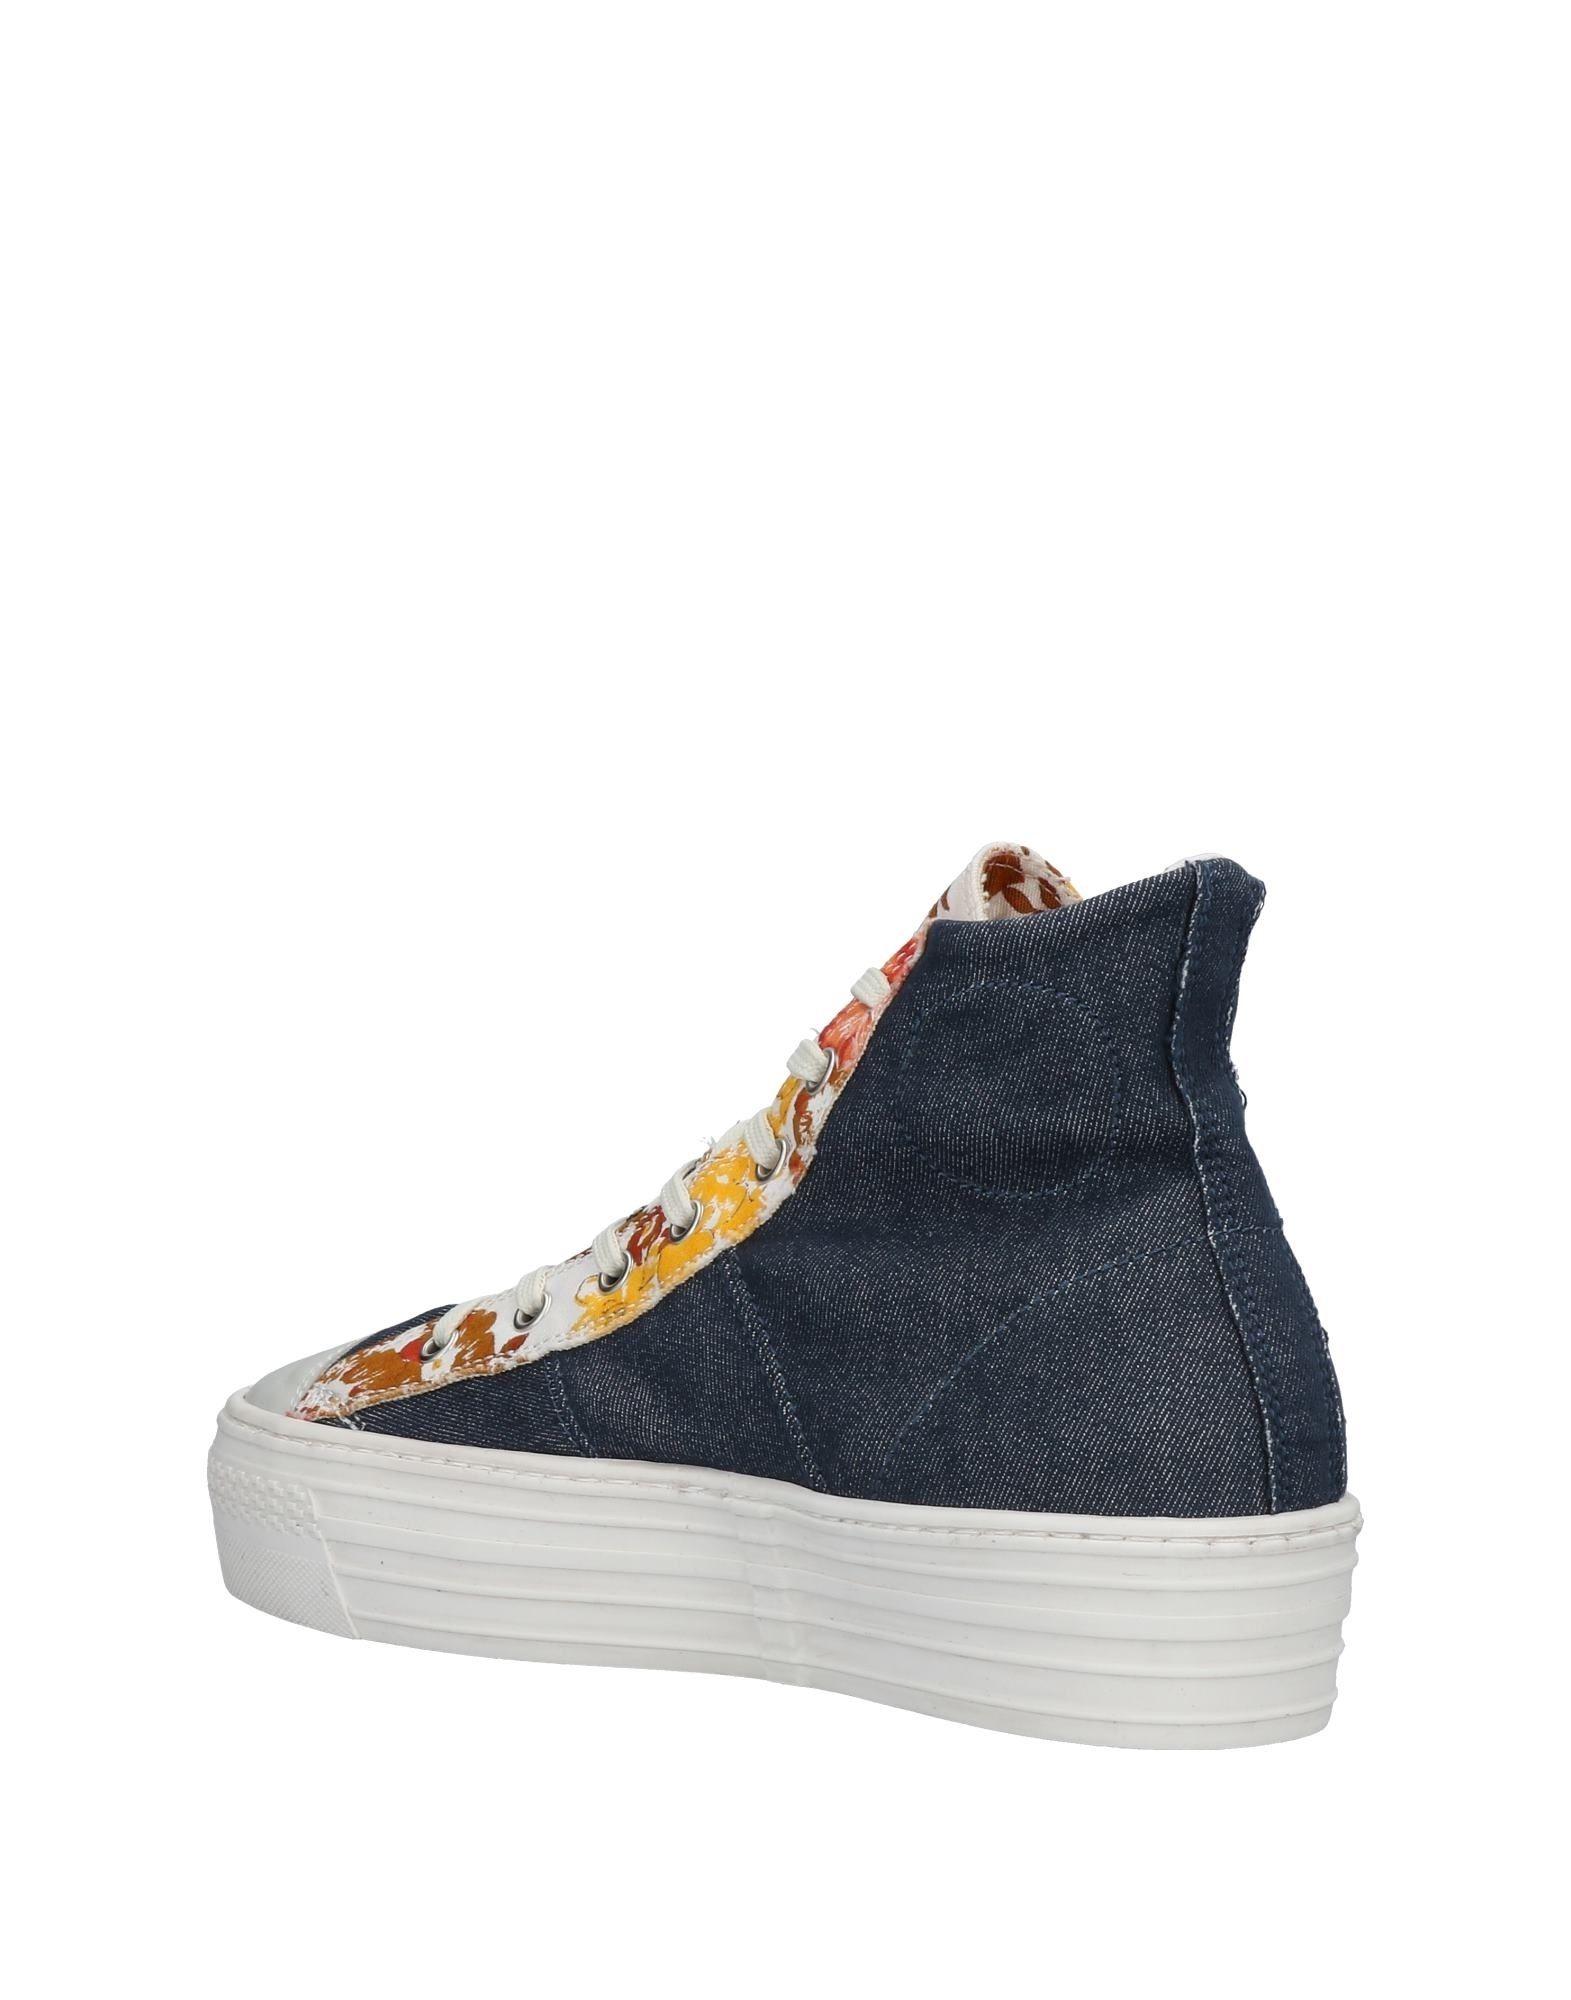 Atos Schuhe Lombardini Sneakers Damen  11491436NE Neue Schuhe Atos 22db74